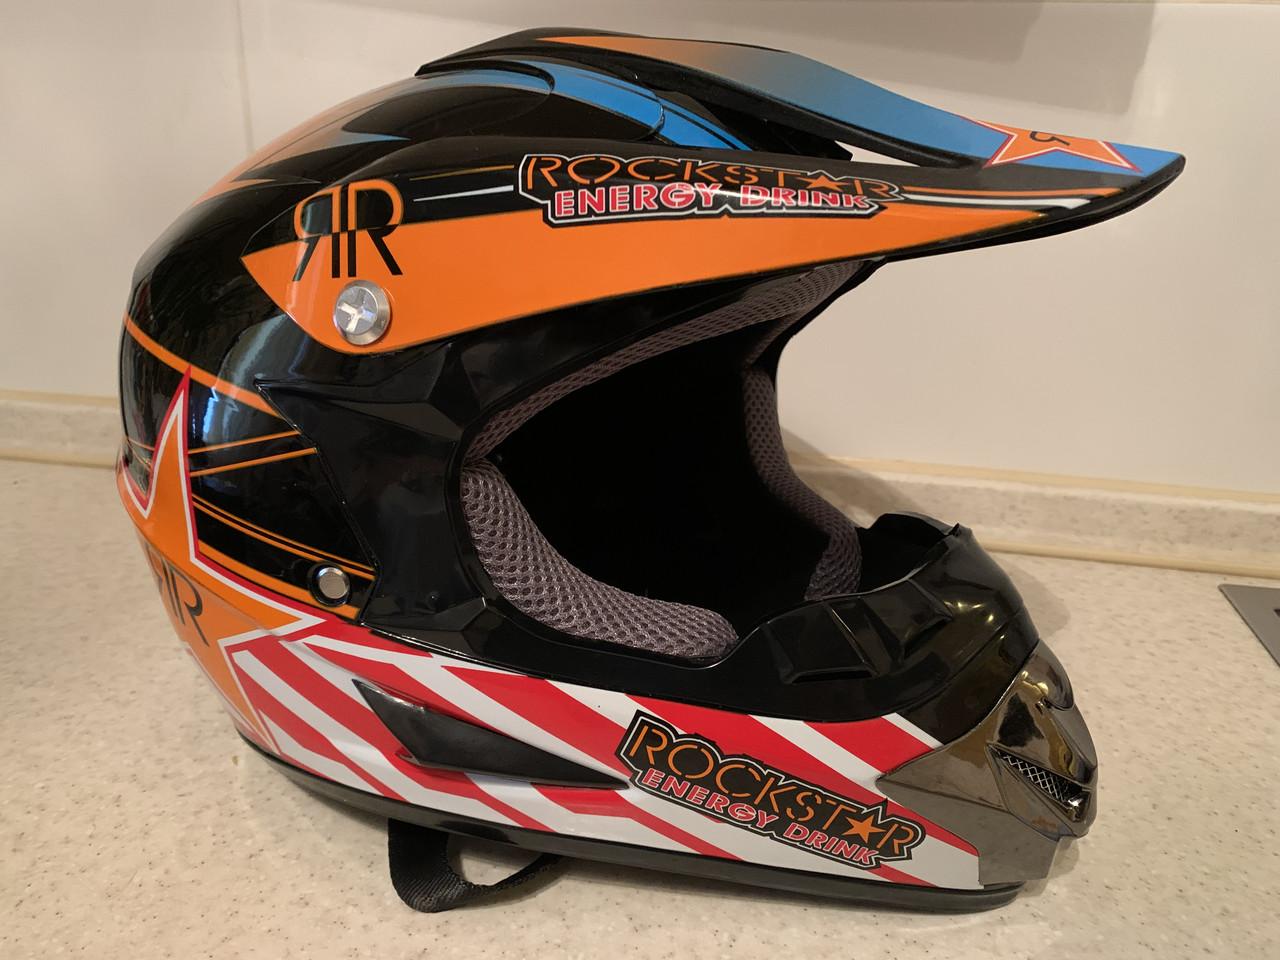 Черно-оранжевый Кроссовый мото шлем Rockstar (эндуро, даунхил)